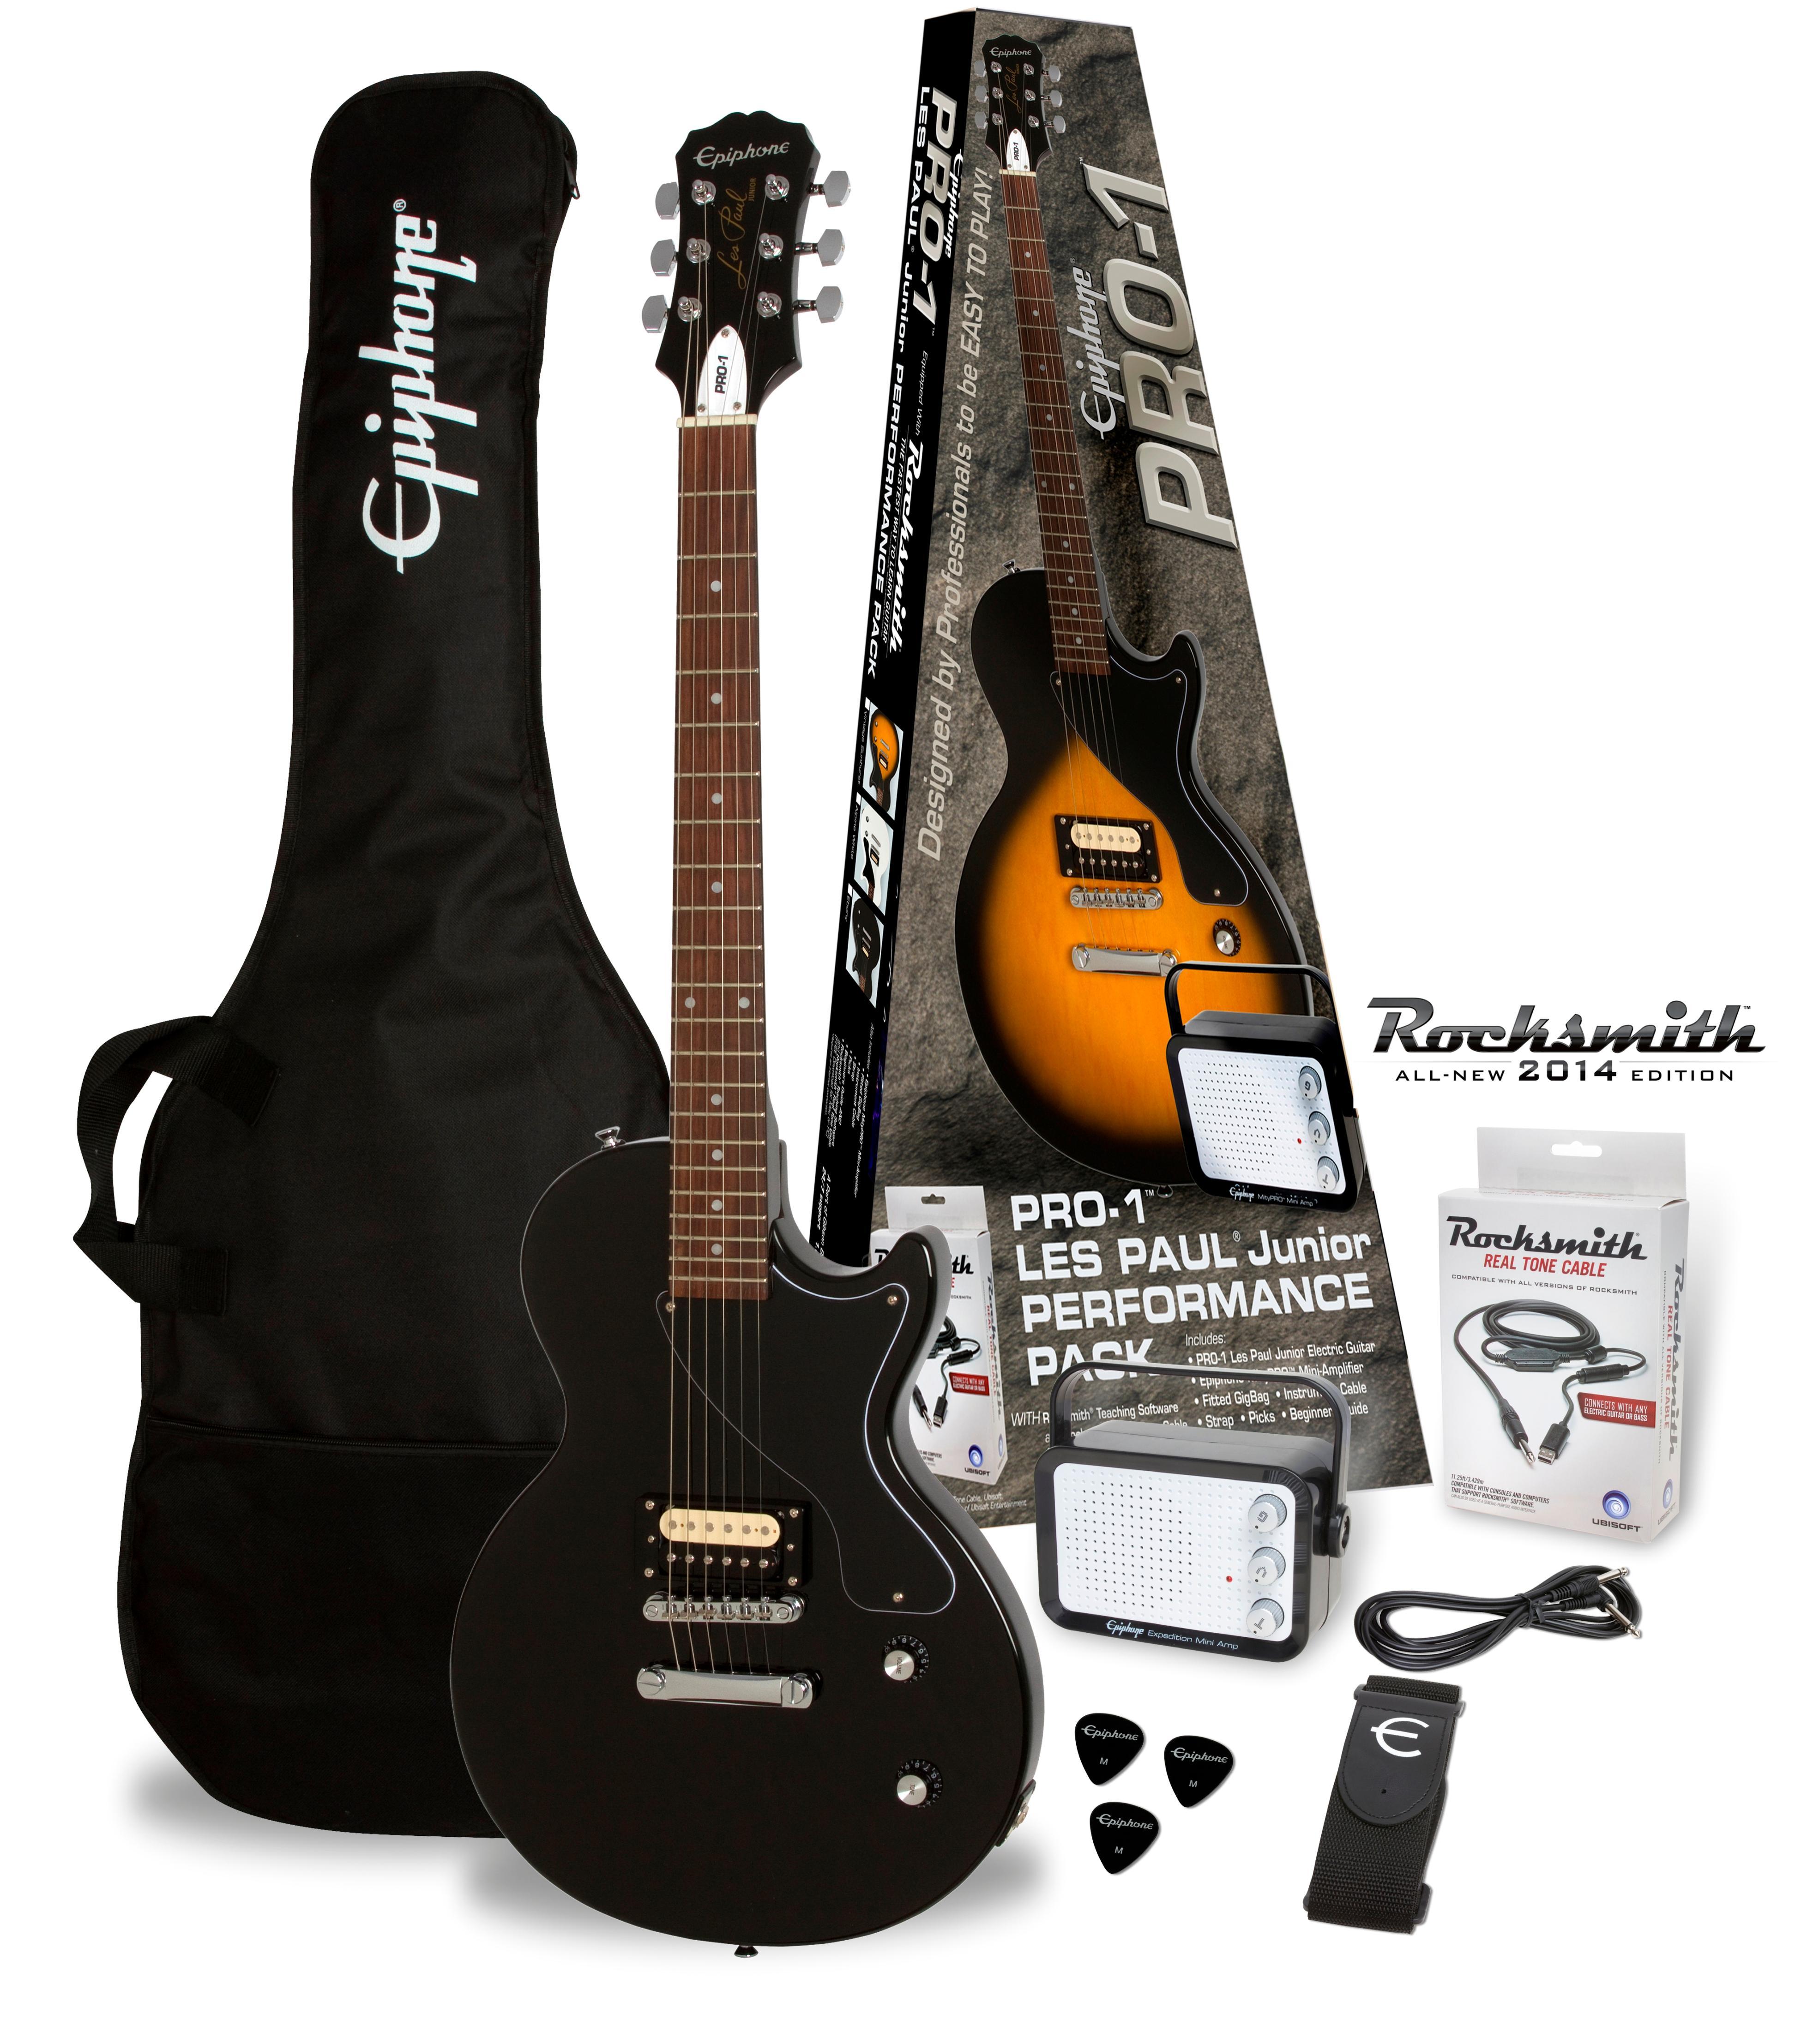 Epiphone Pro 1 Les Paul Junior Performance Guitar Starter